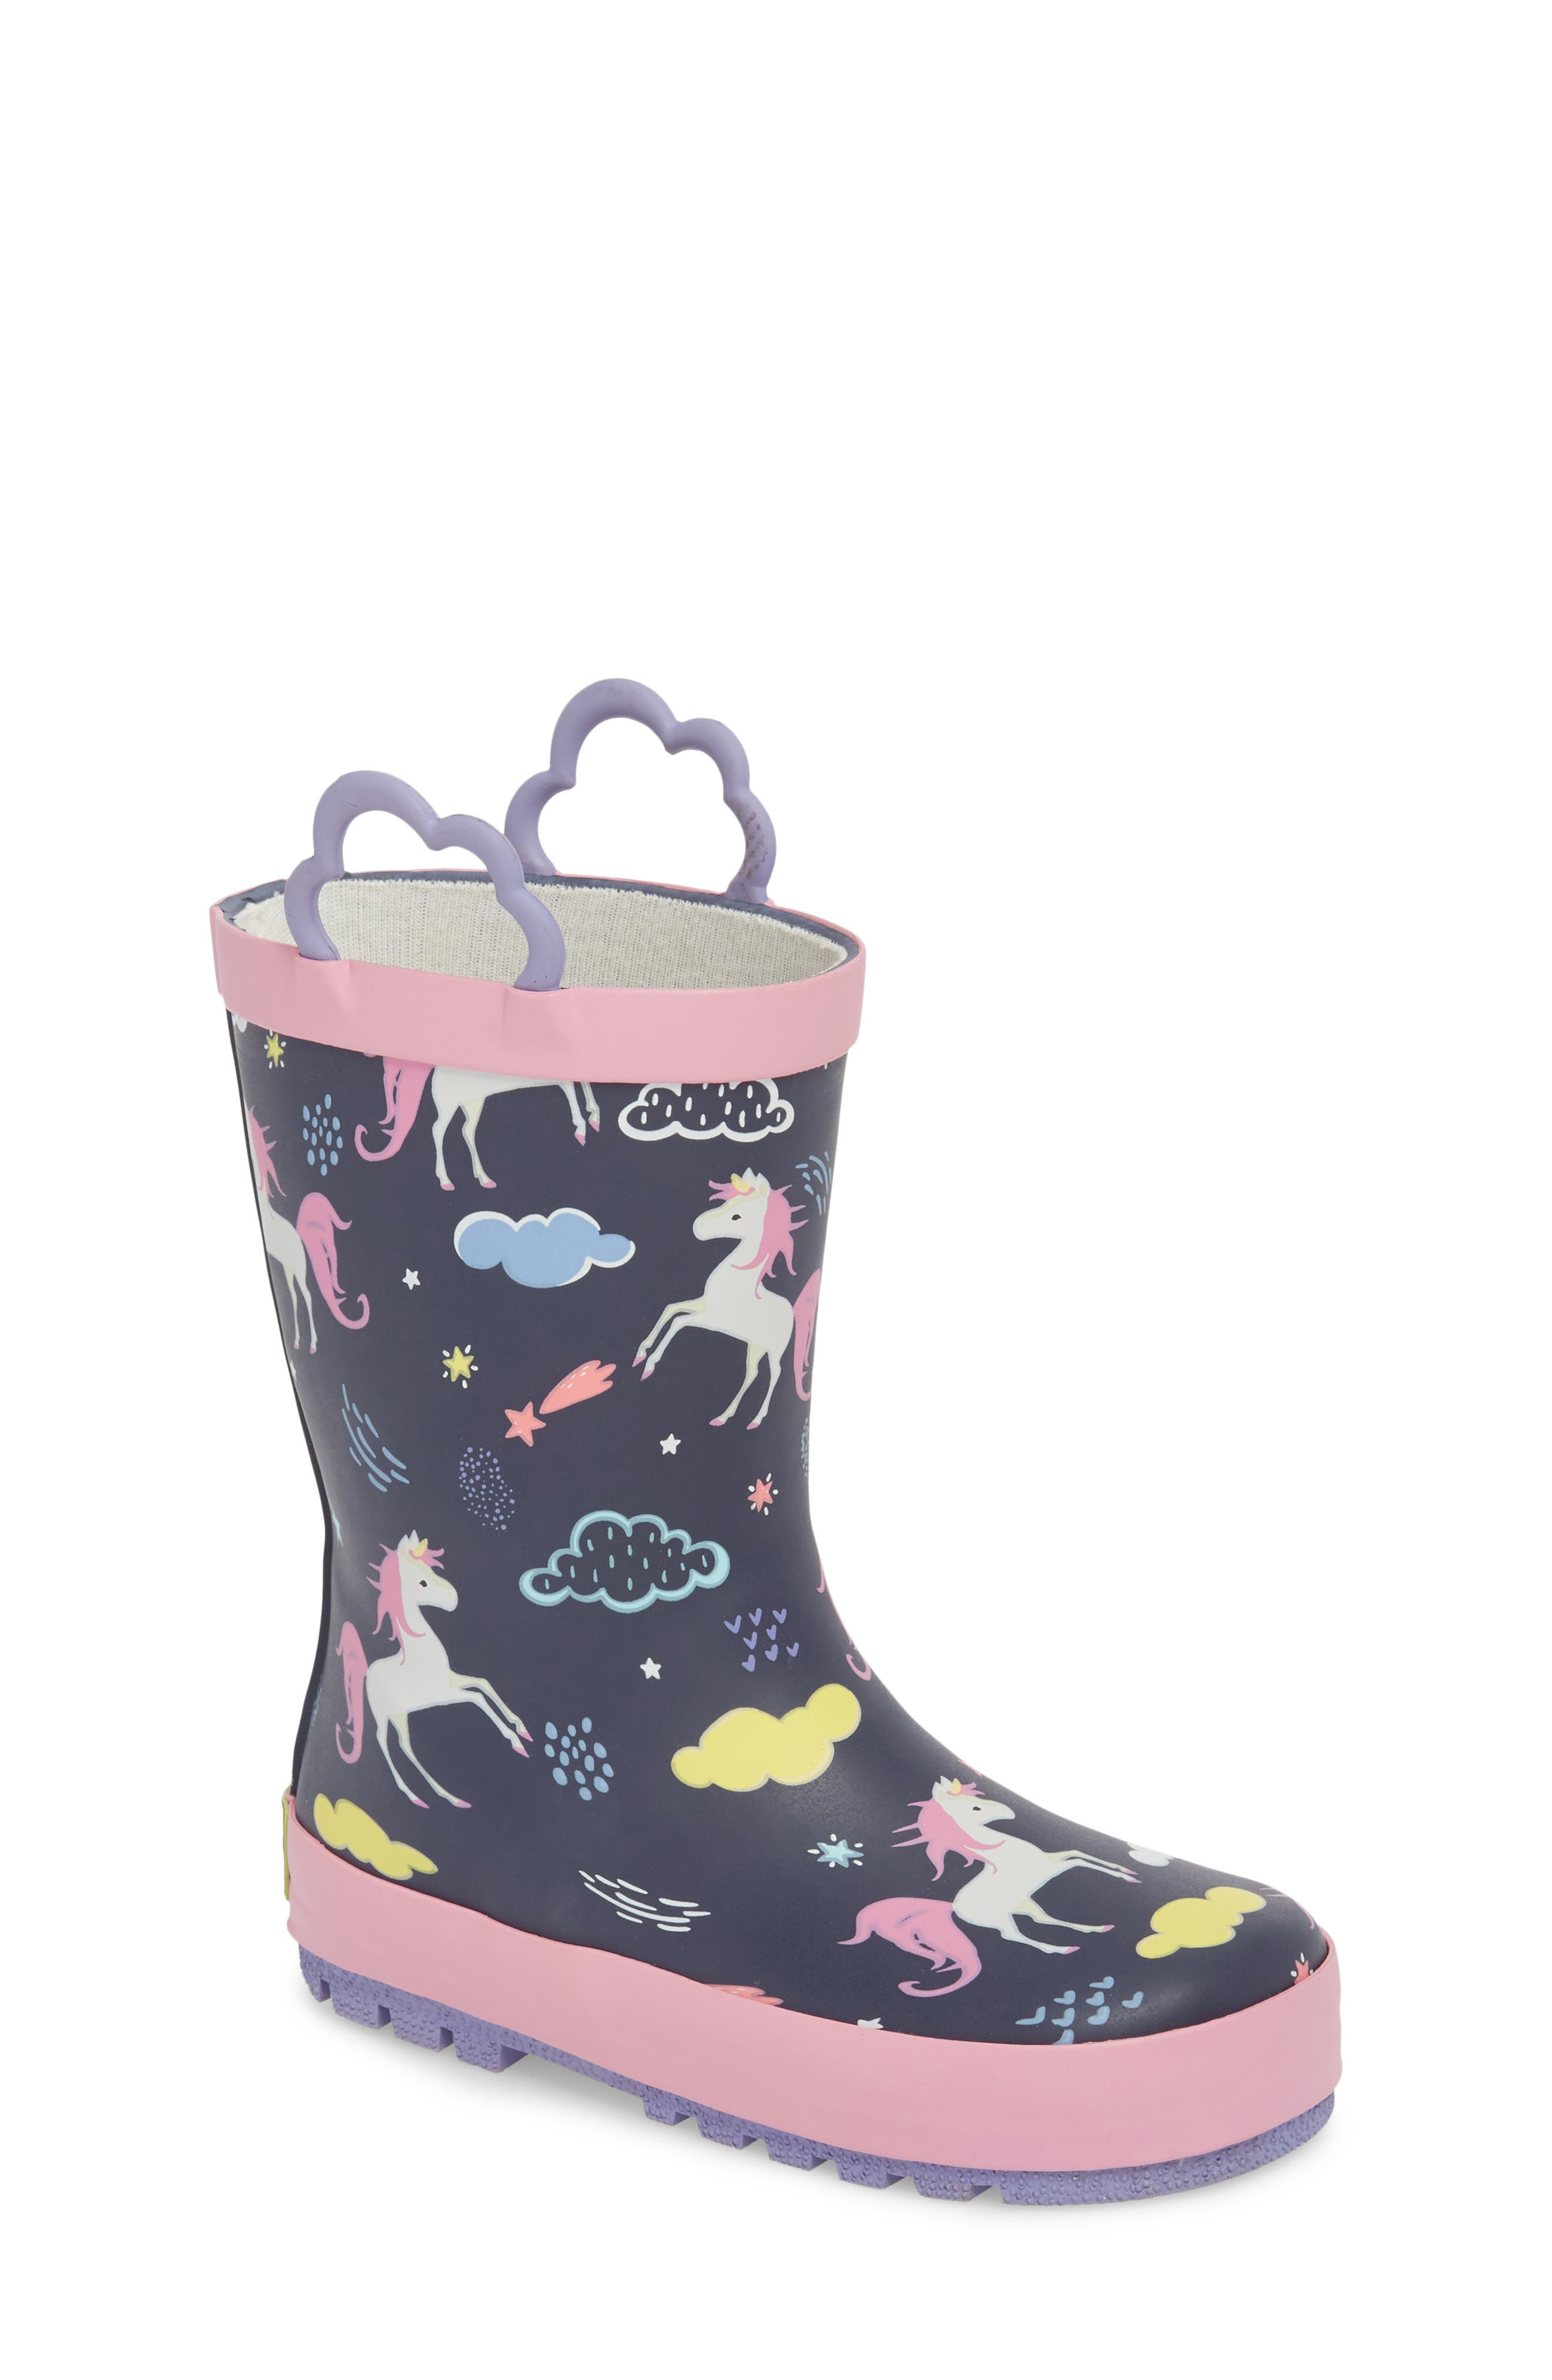 Unicorn Play Waterproof Rain Boot,                             Main thumbnail 1, color,                             421